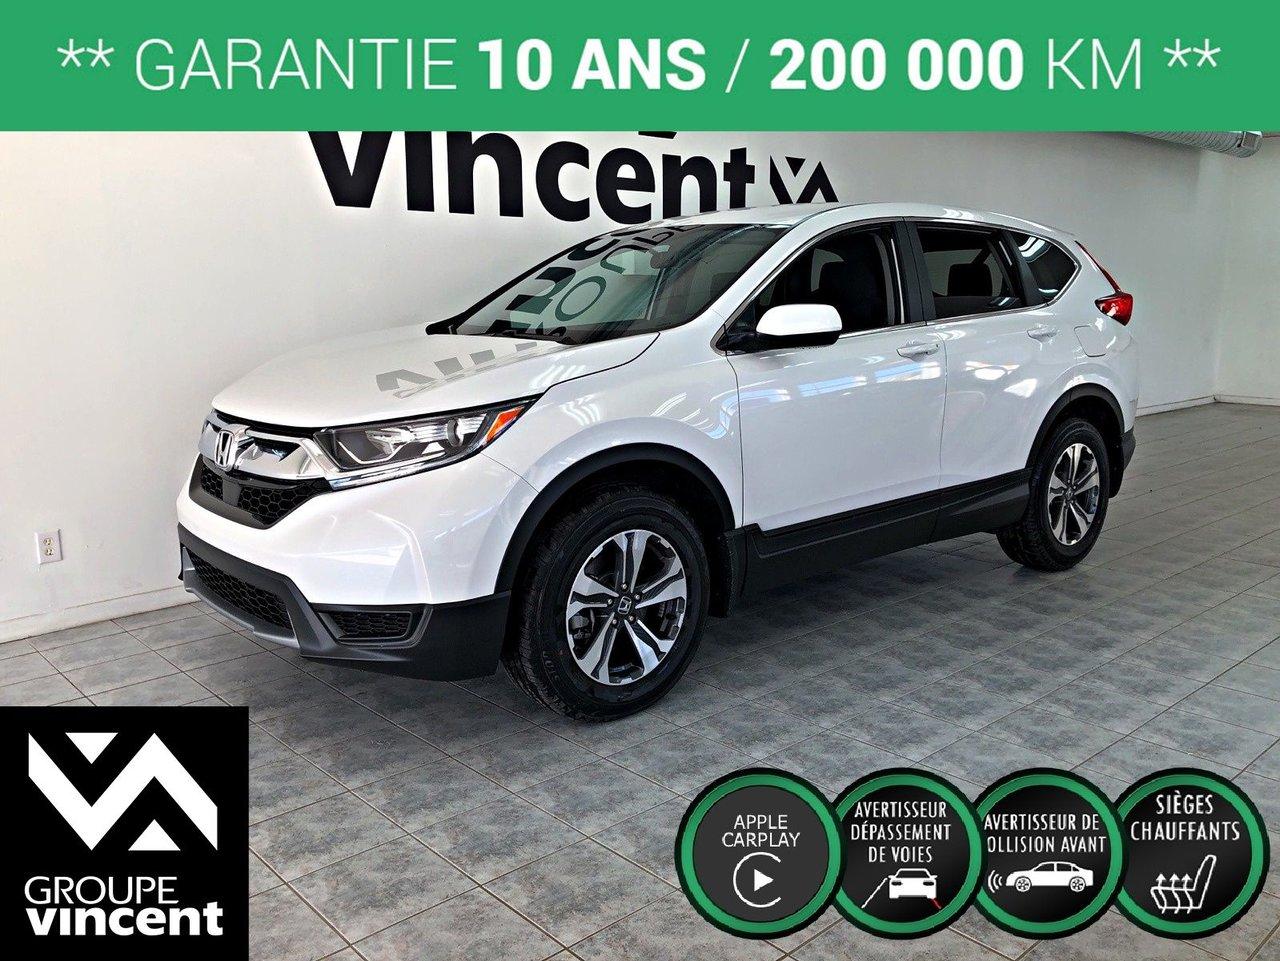 2019 Honda  CR-V LX AWD ** GARANTIE 10 ANS **